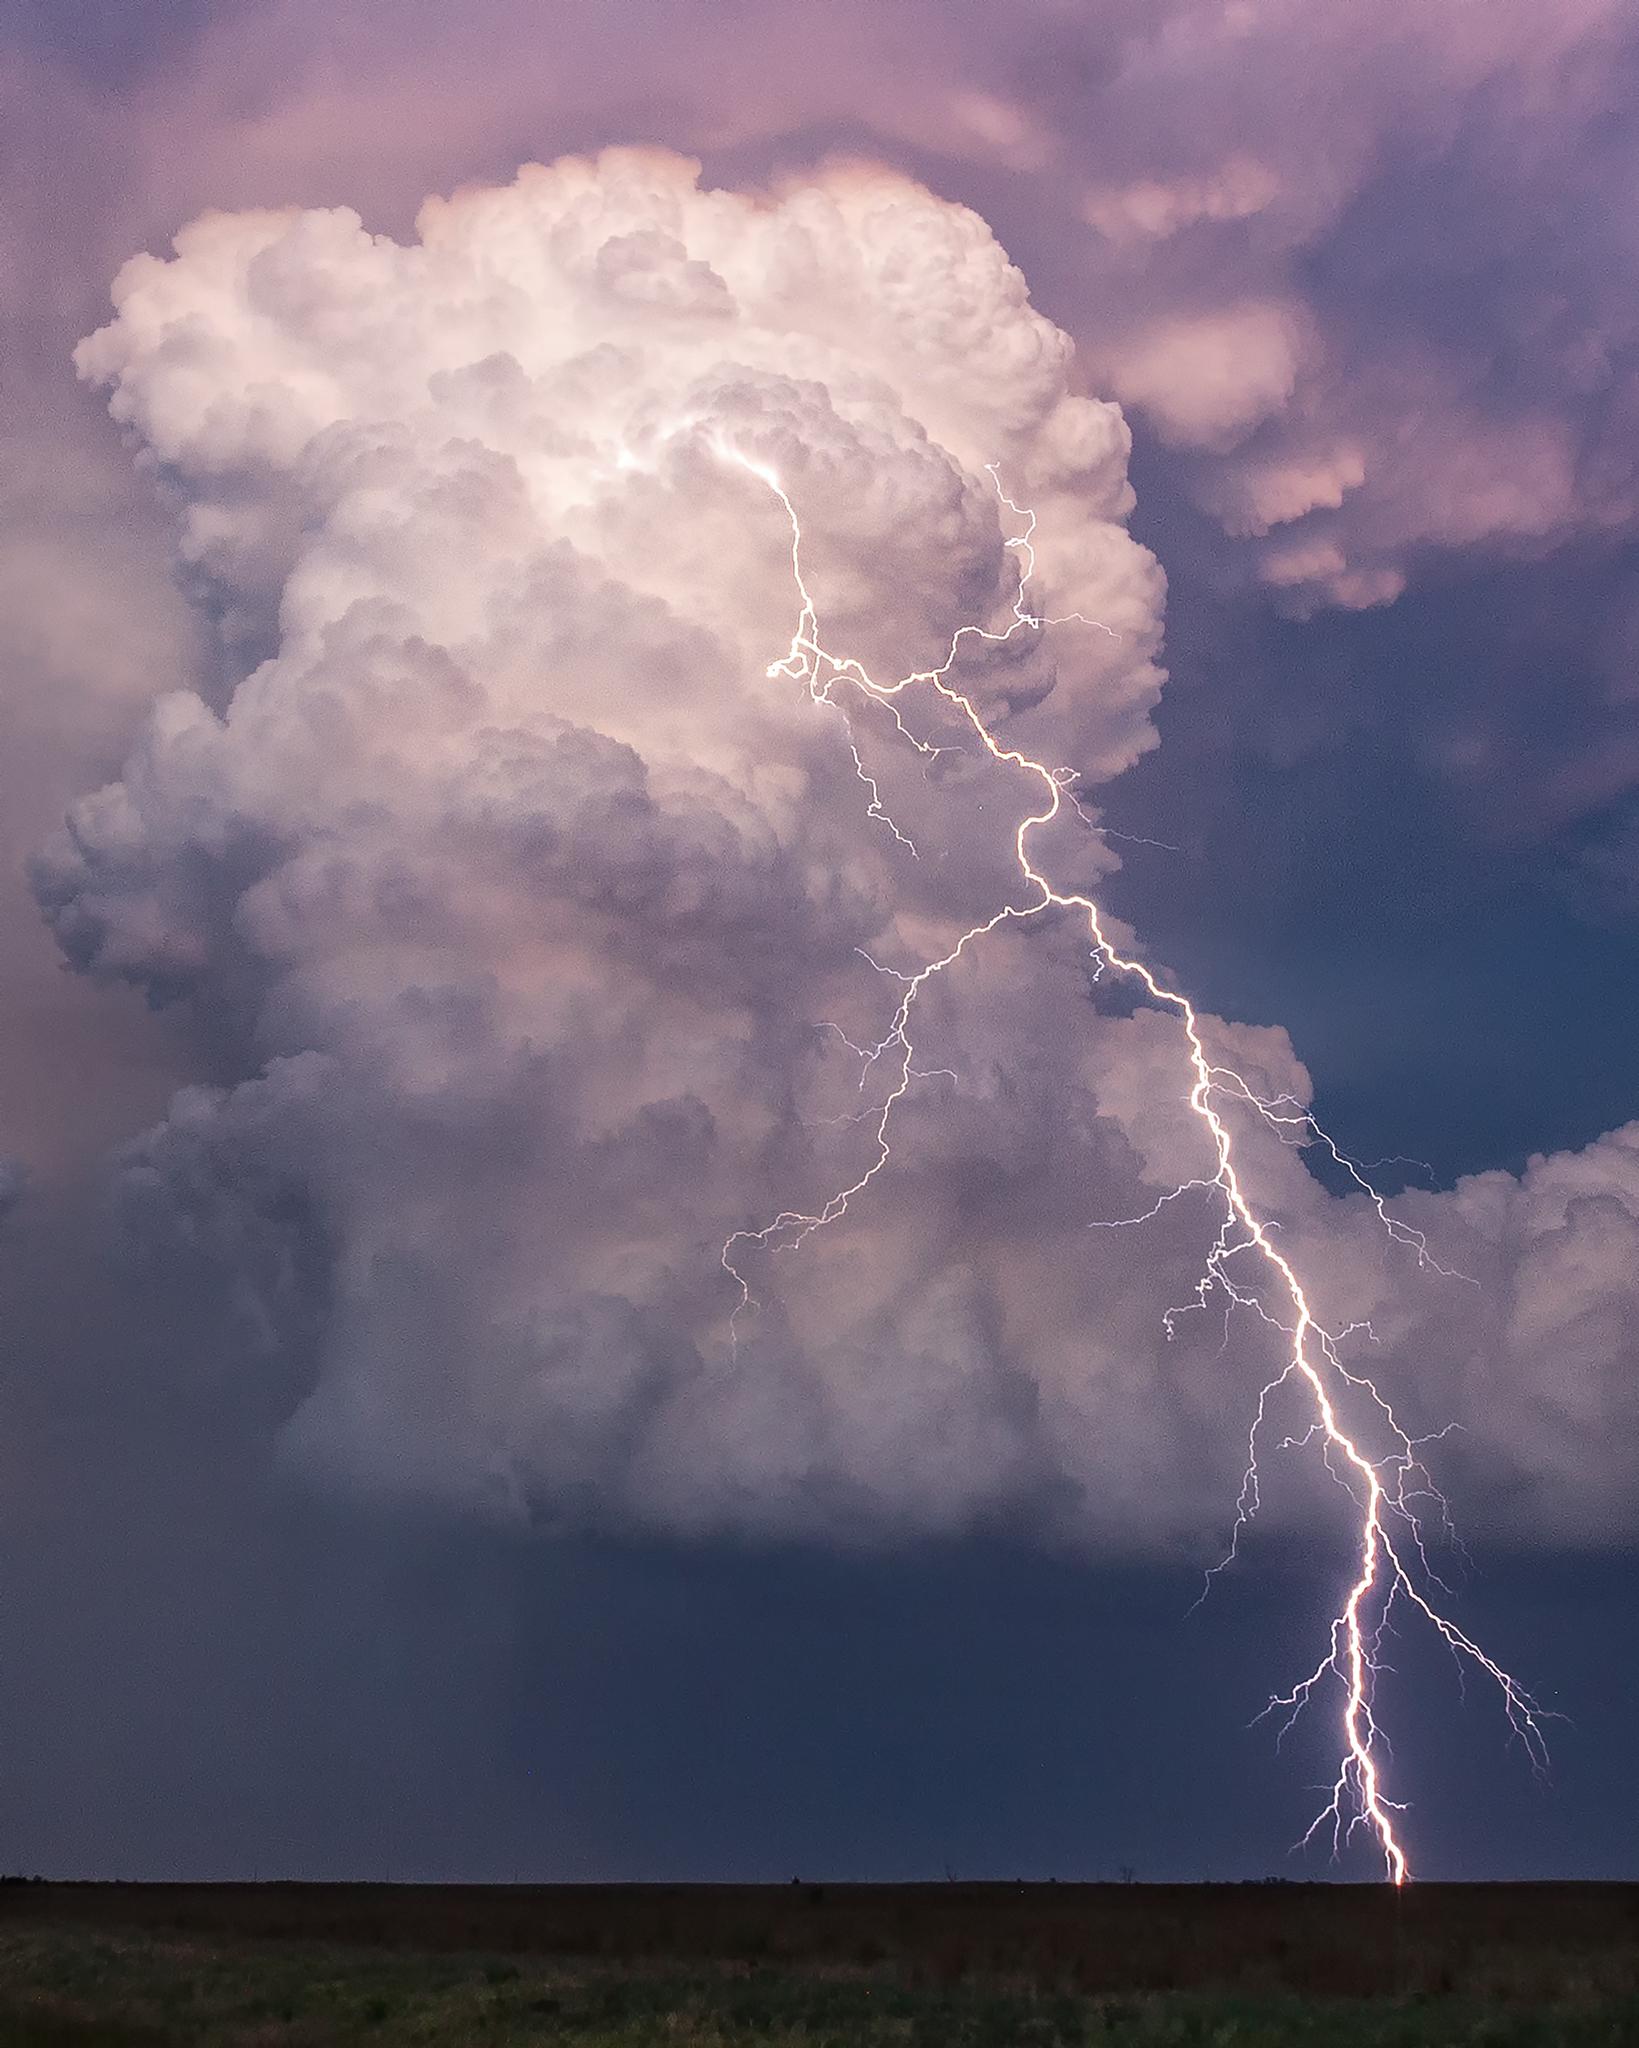 storm chase tour photography workshop adventure texas oklahoma tornado